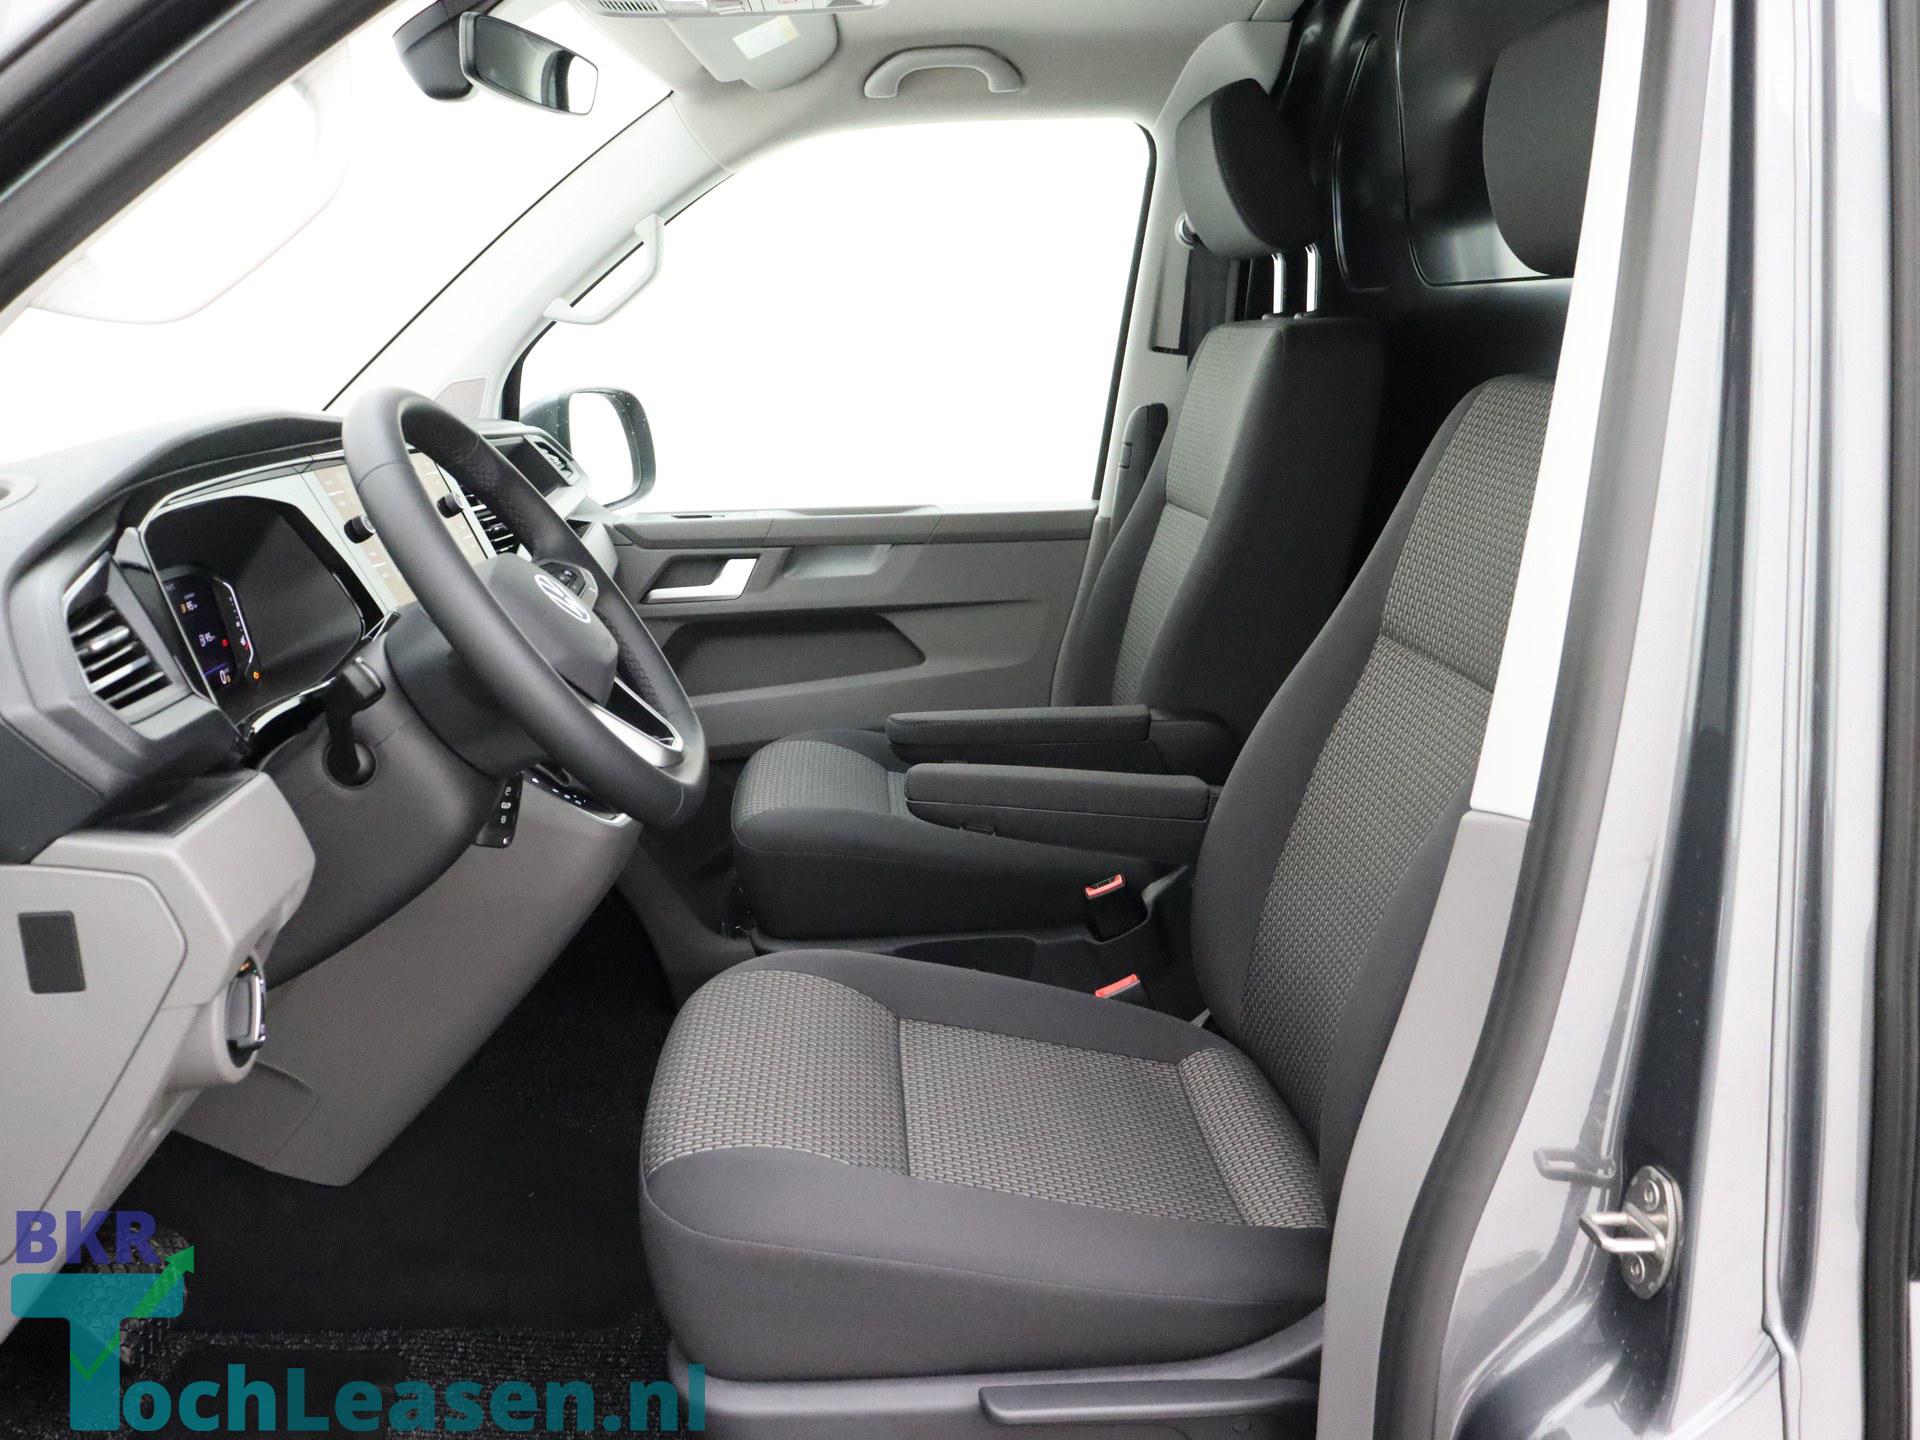 BKR toch leasen - Volkswagen Transporter - Grijs 15